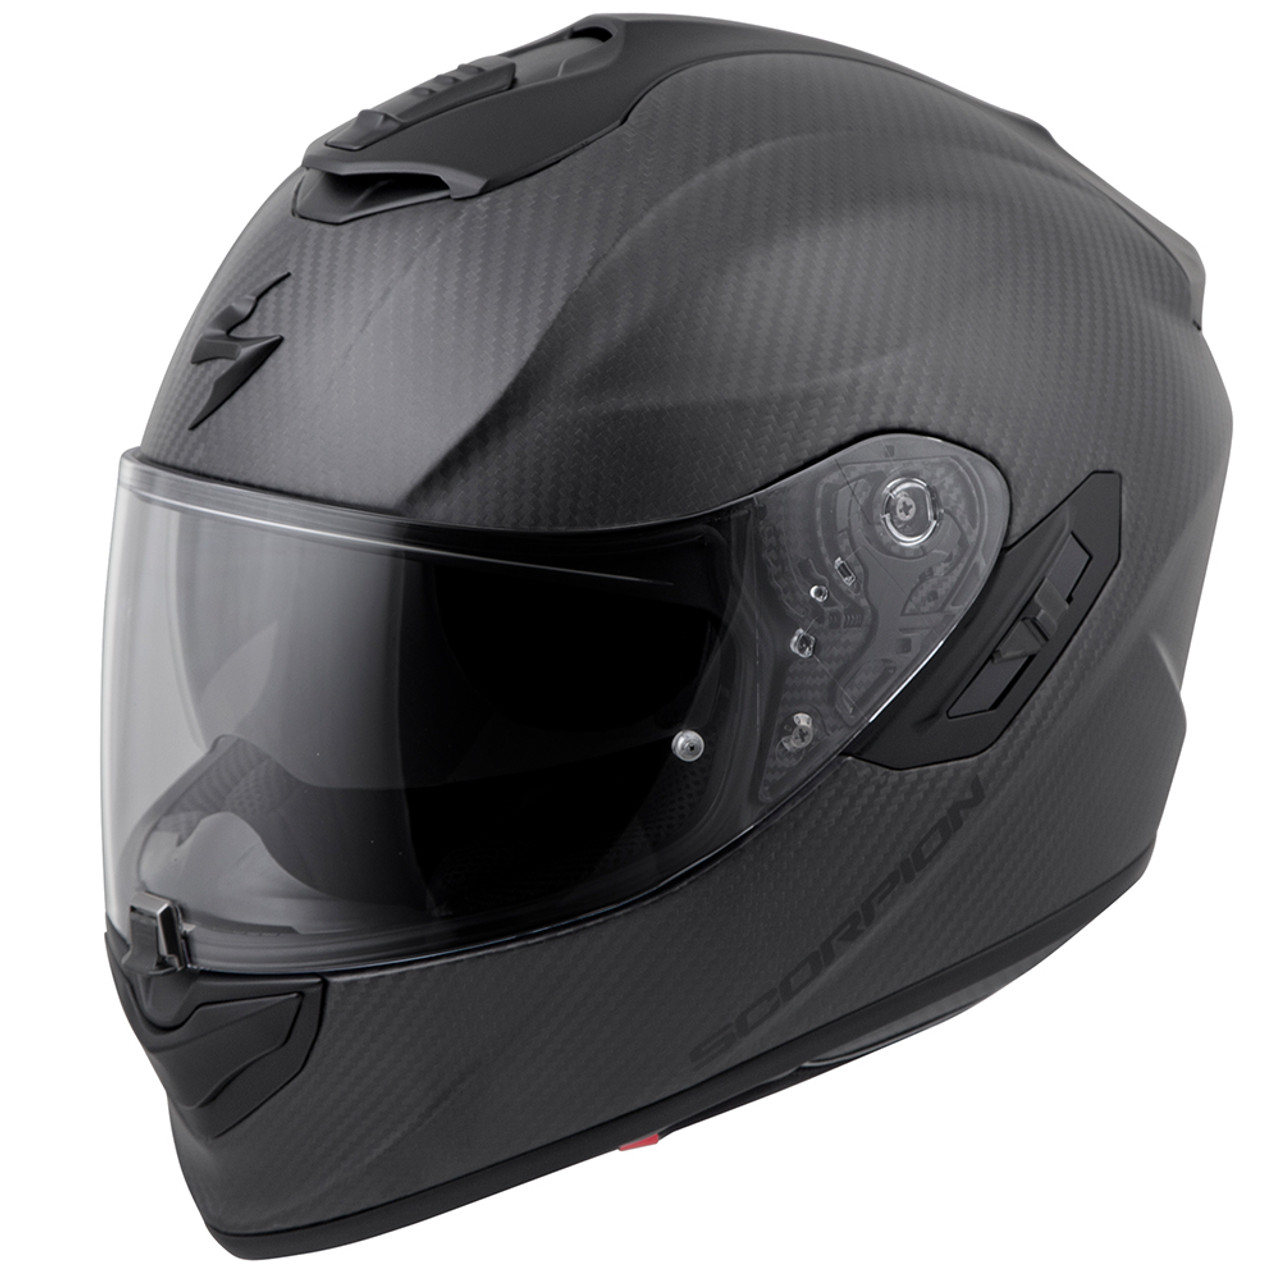 Carbon Fiber Motorcycle Helmets >> Scorpion Exo St1400 Carbon Solid Helmet